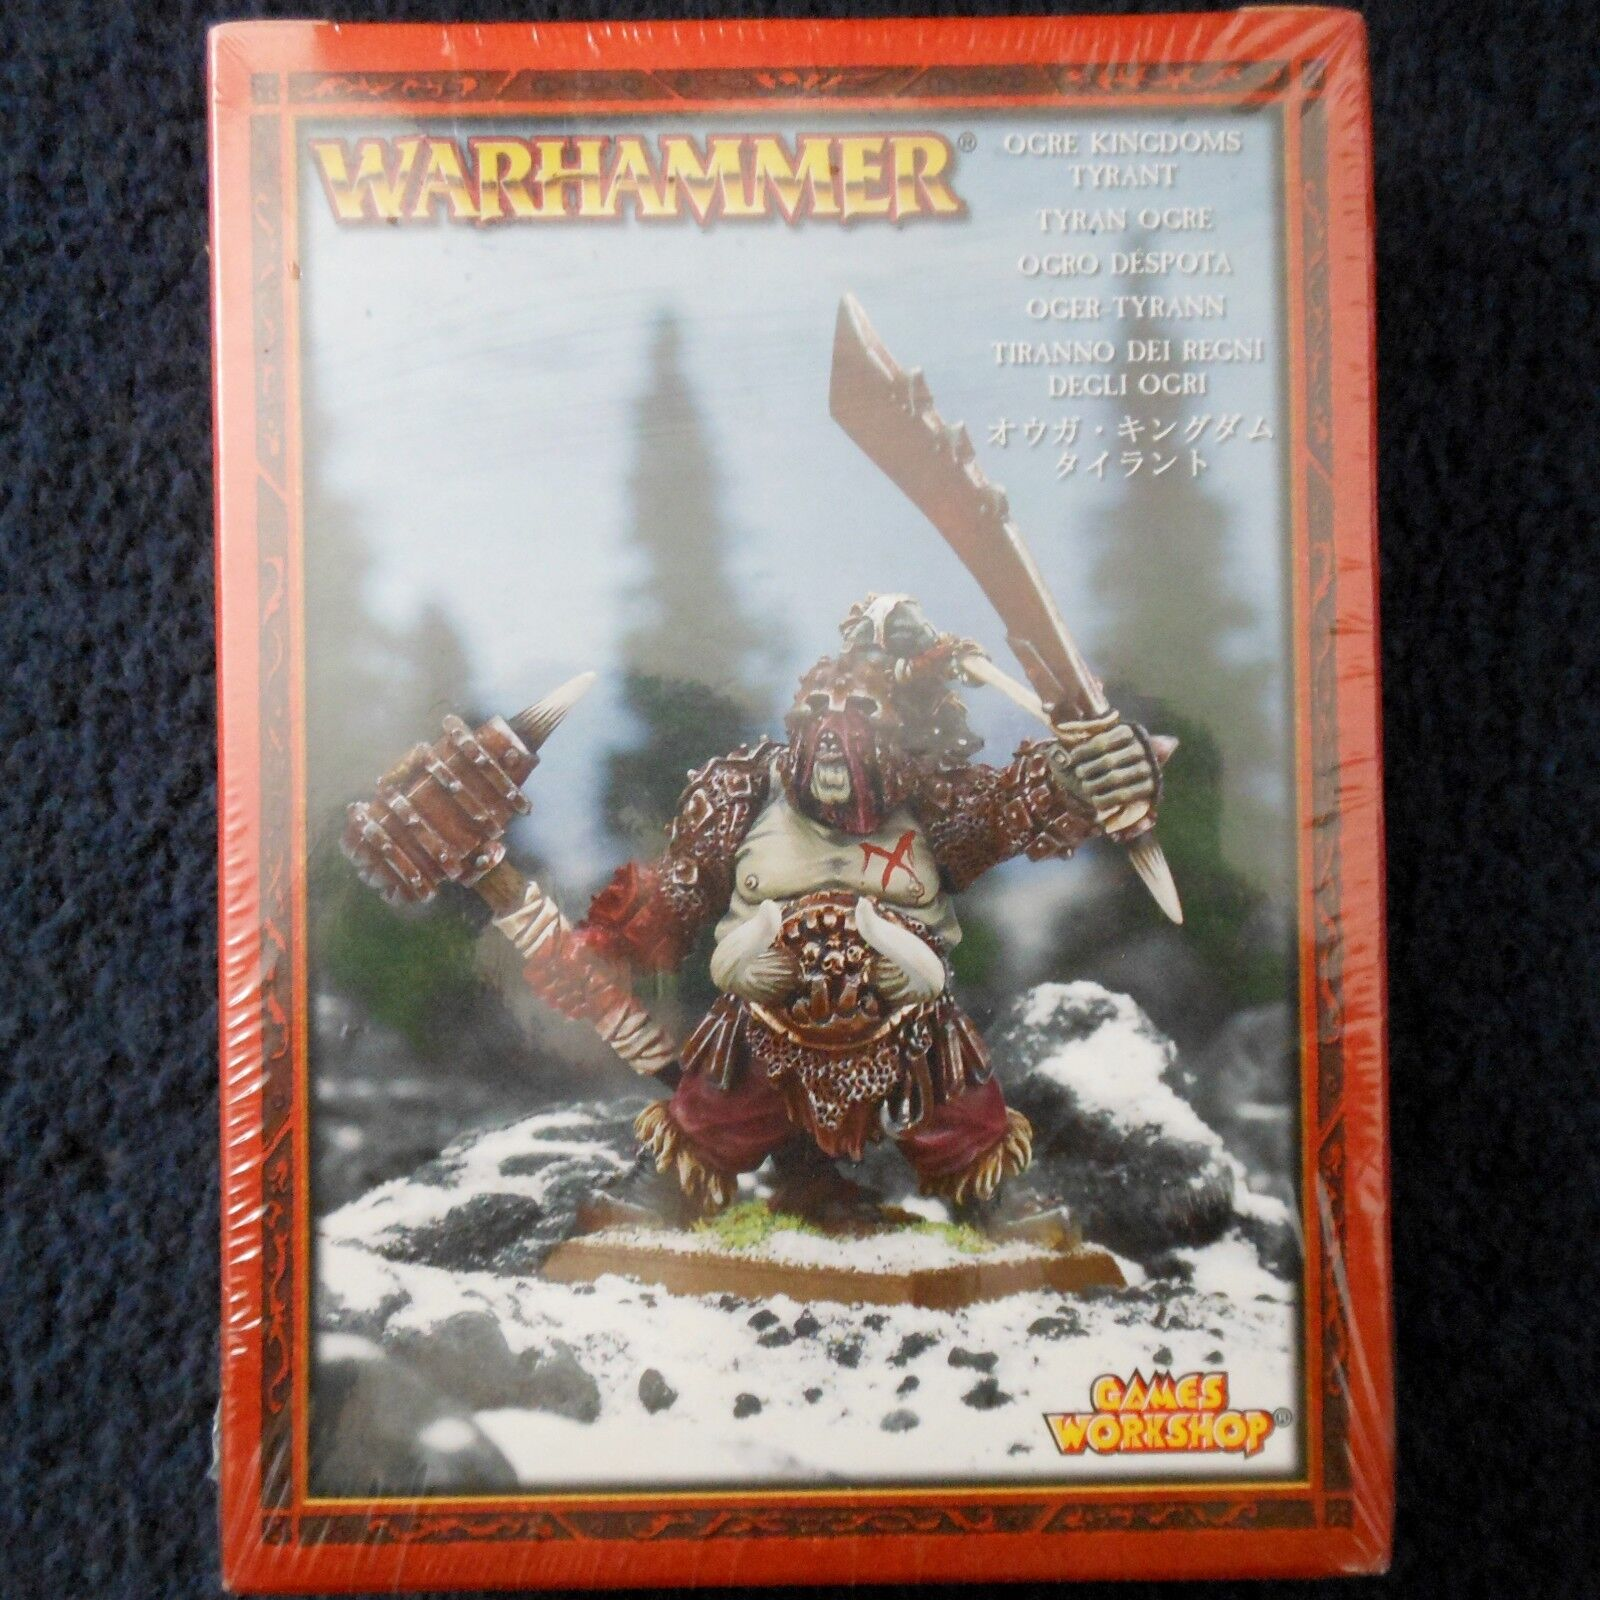 2005 reinos ogros tirano Warhammer army Juegos Workshop ogor líder Maneater MIB